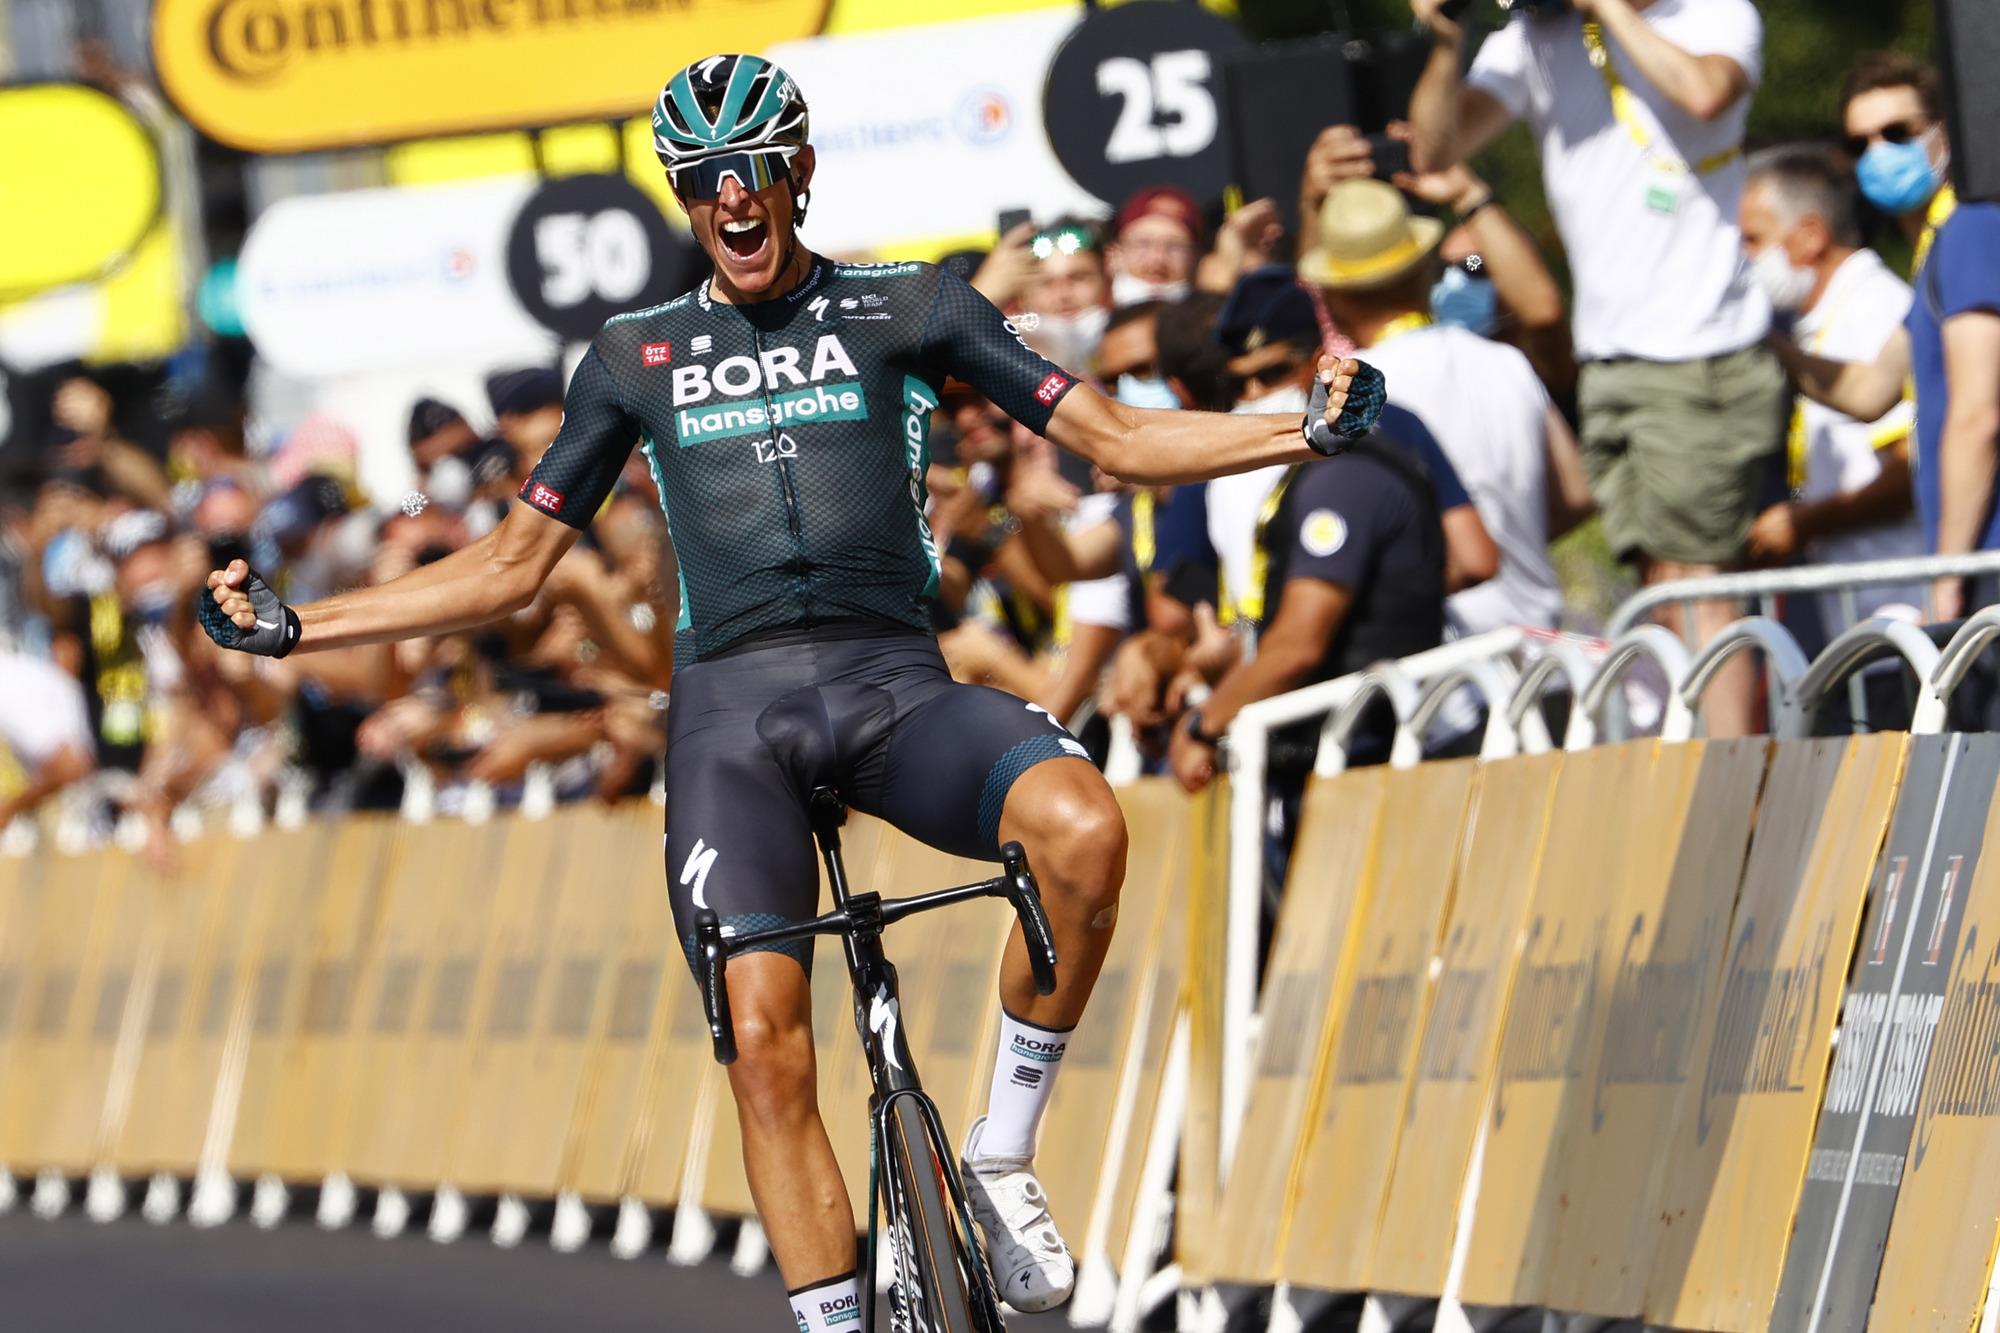 Tour de France 2021 - 108th Edition - 12th stage Saint-Paul-Trois-Chateaux - Nimes 159.4 km - 07/07/2021 - Nils Politt (GER - Bora - Hansgrohe) - photo Luca Bettini/BettiniPhoto©2021